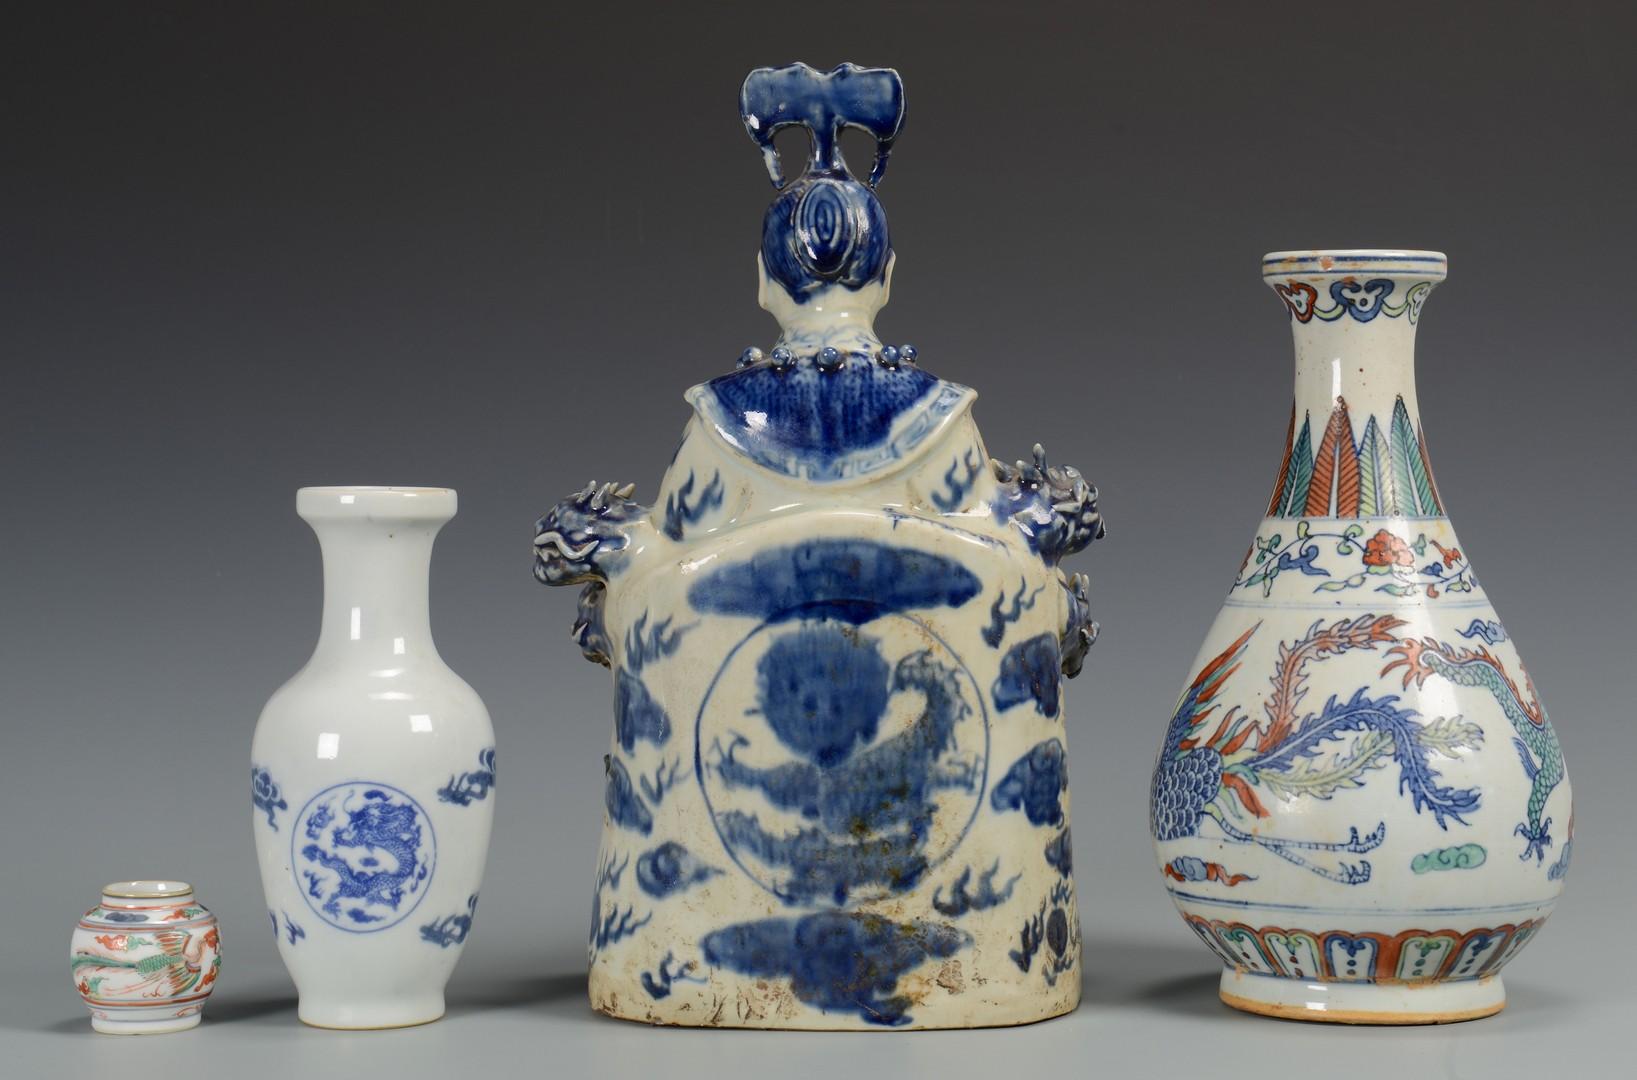 Lot 3594232: Immortal Figure & 3 Vases